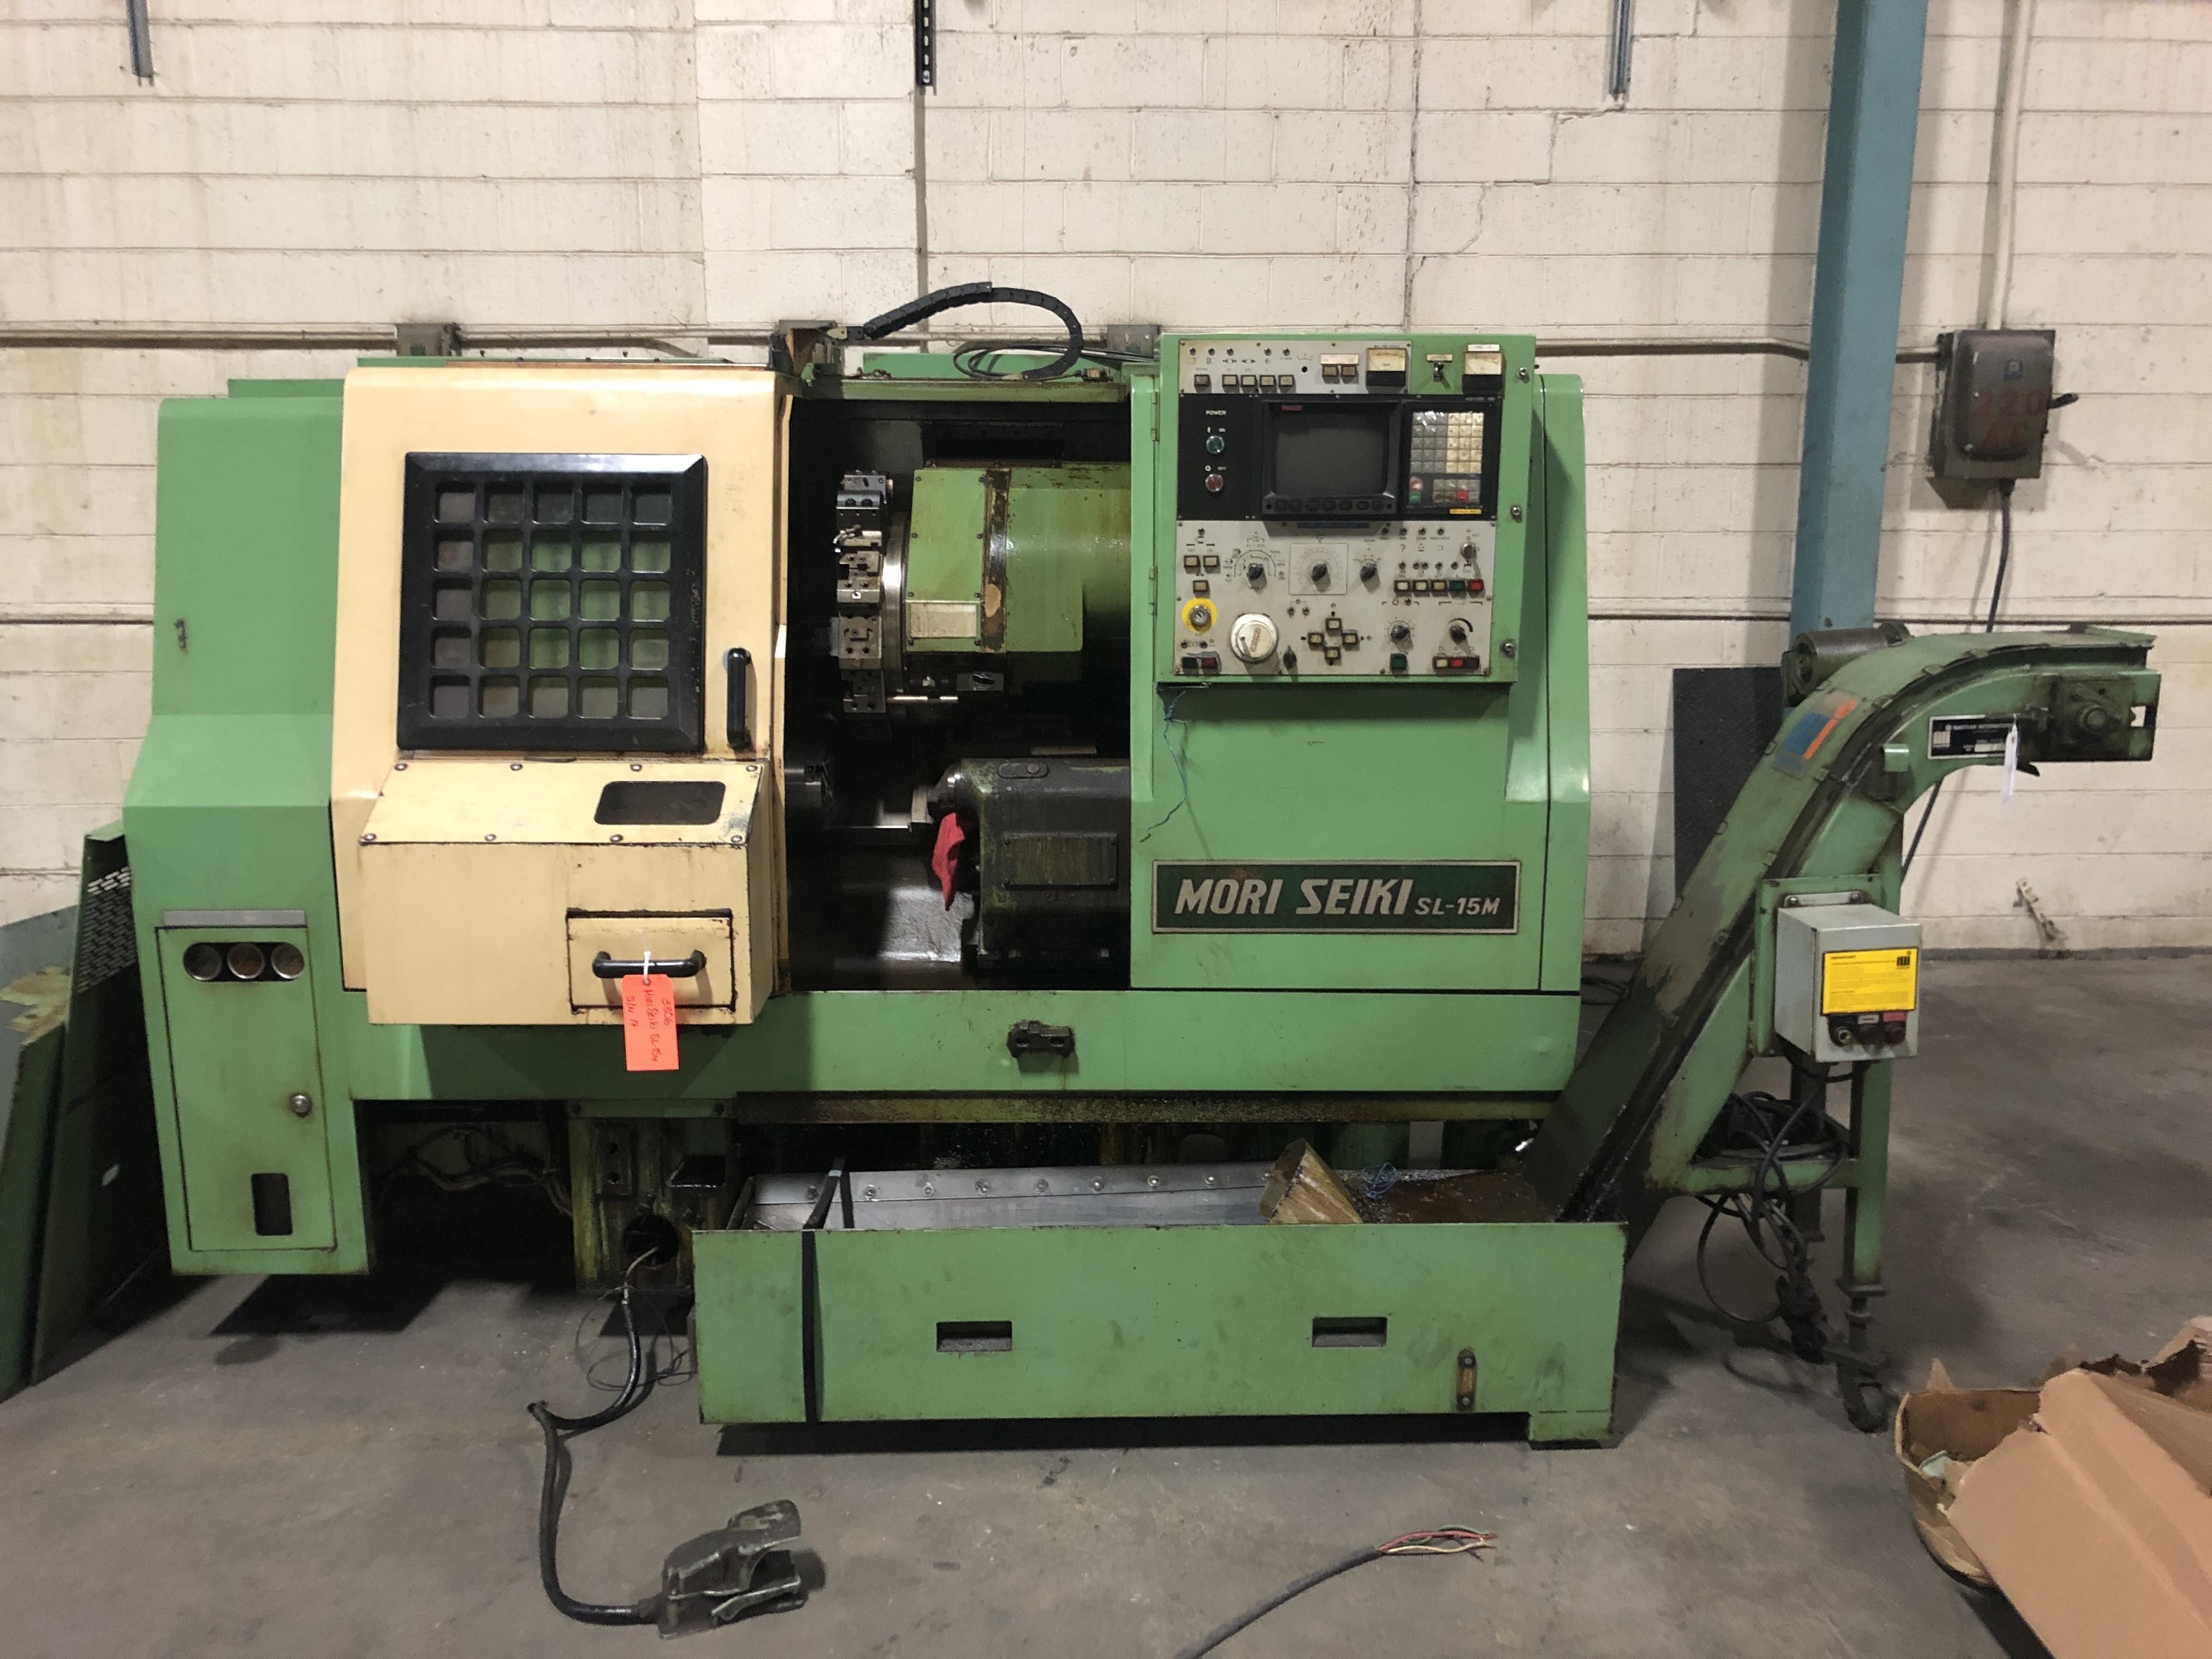 Mori Seiki SL-15M CNC Lathe, Fanuc 10T Control, 6